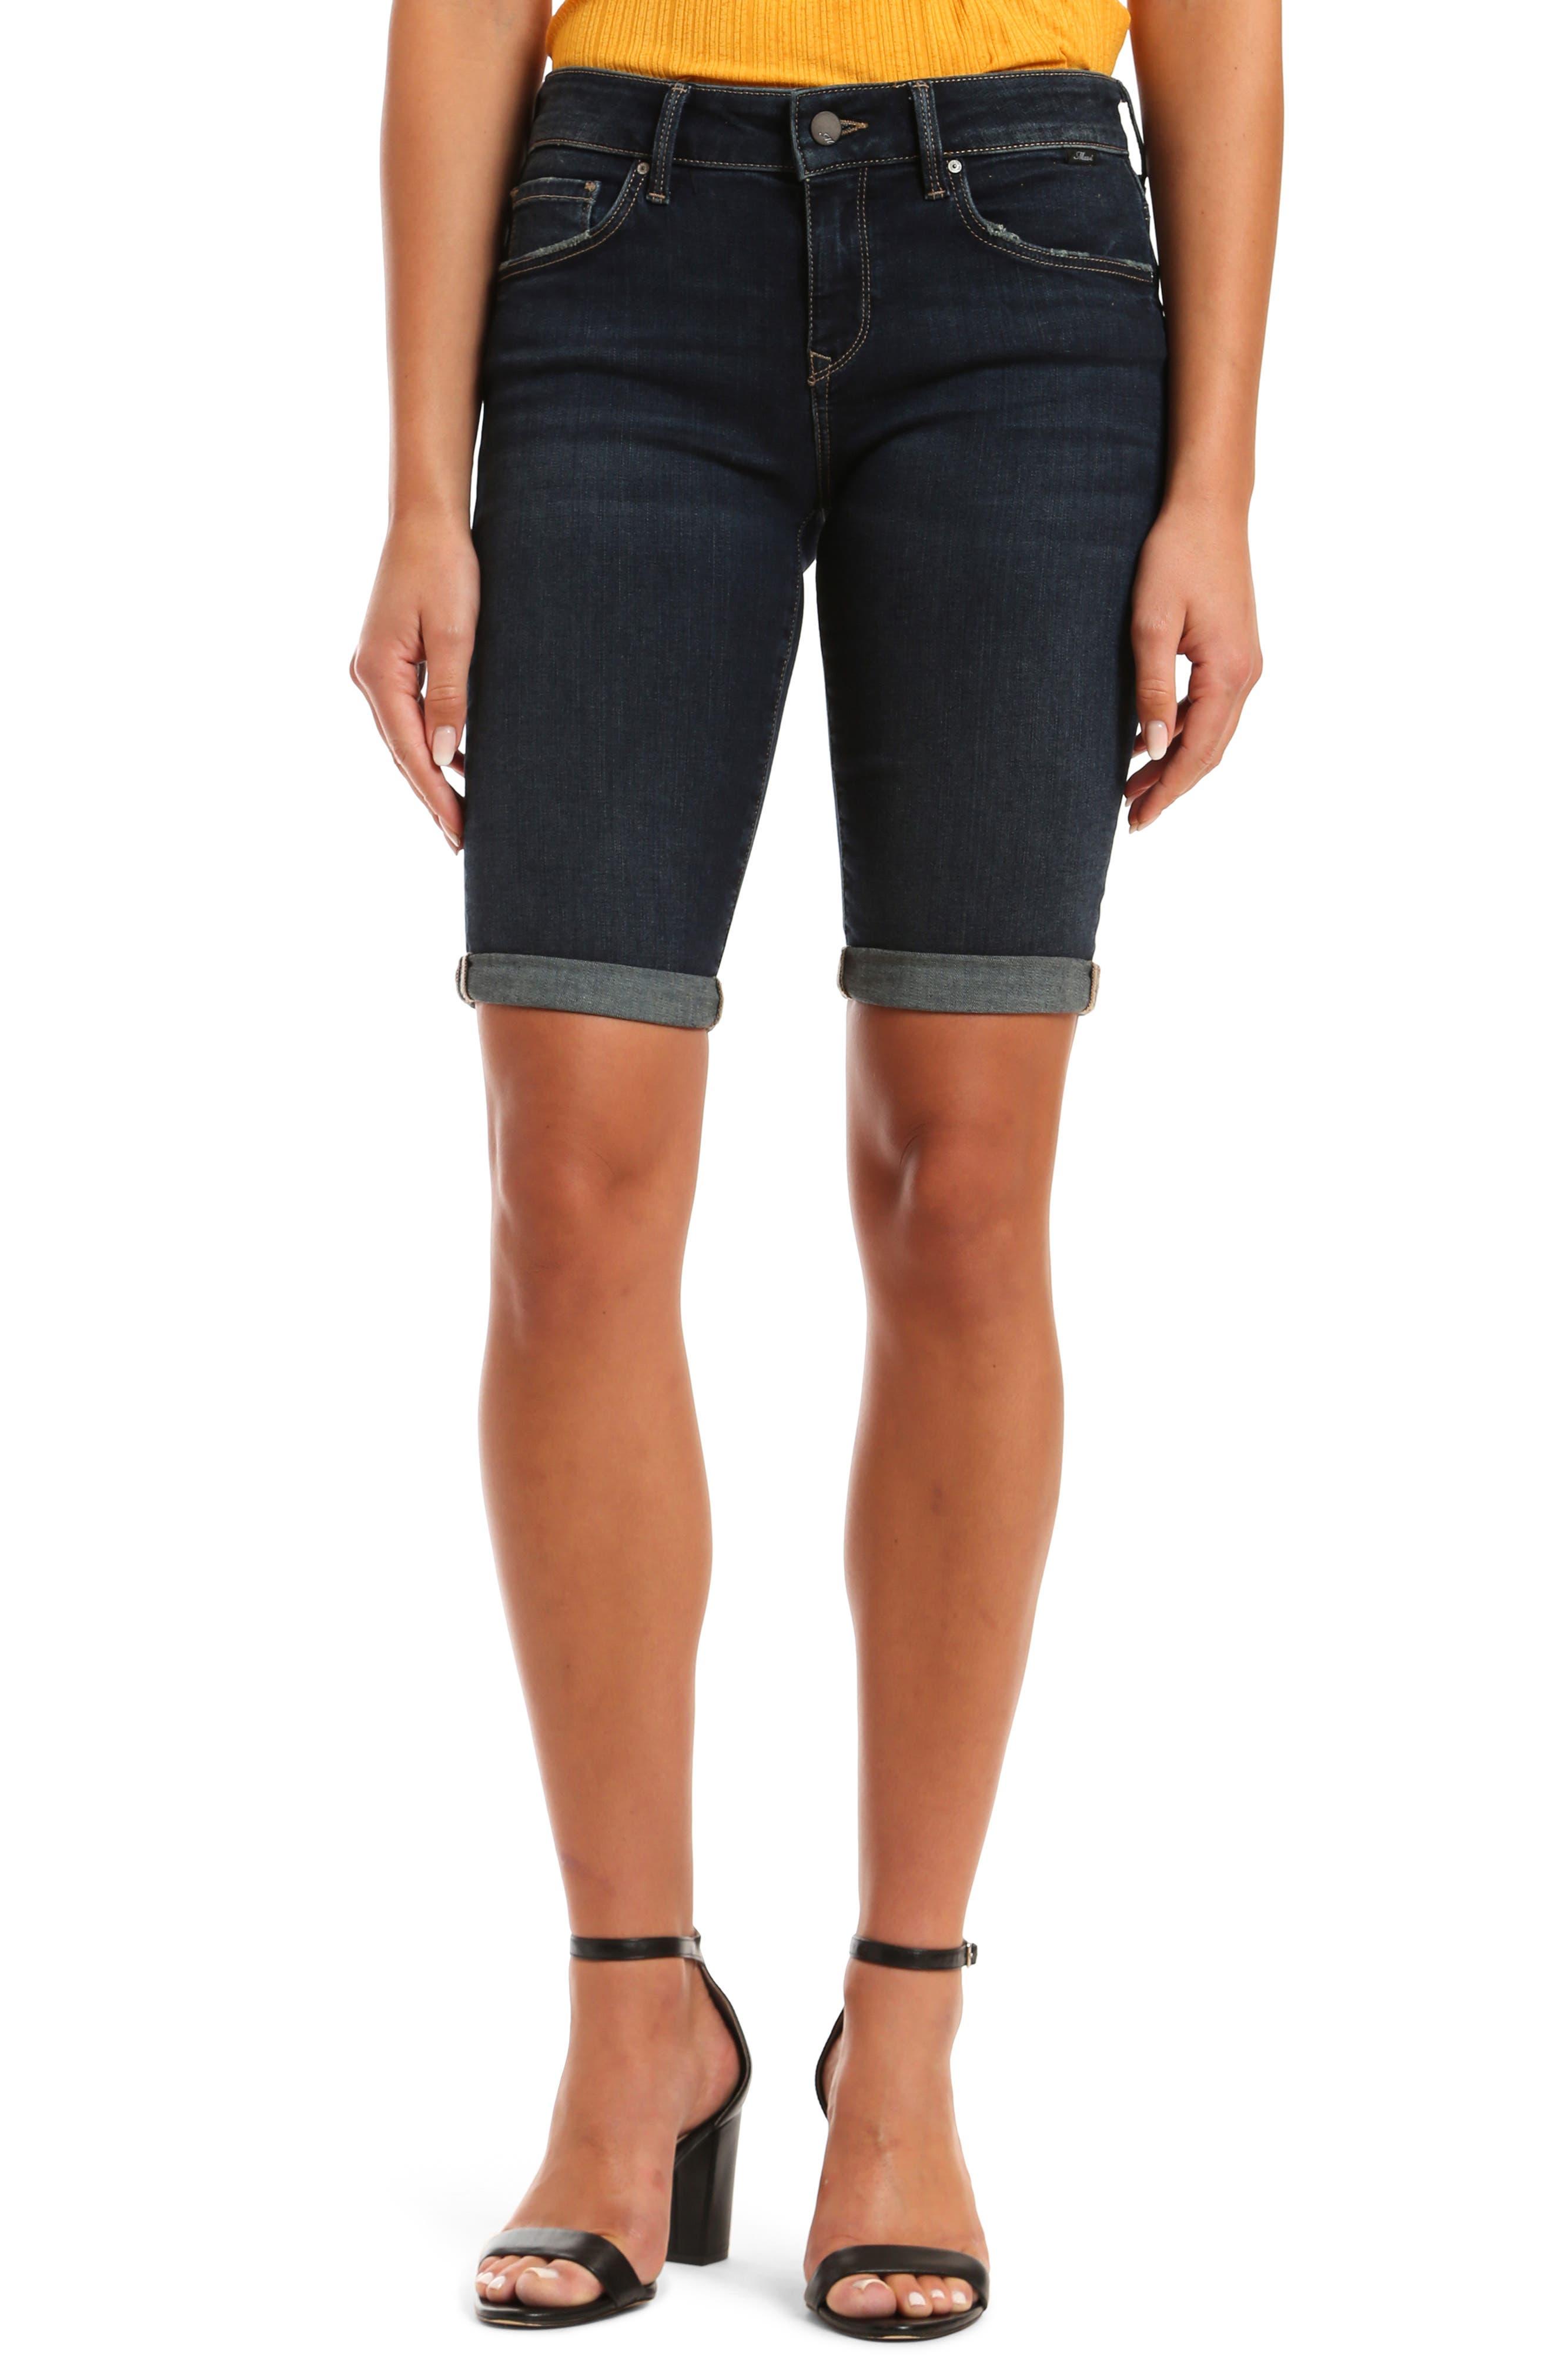 Karly Denim Bermuda Shorts